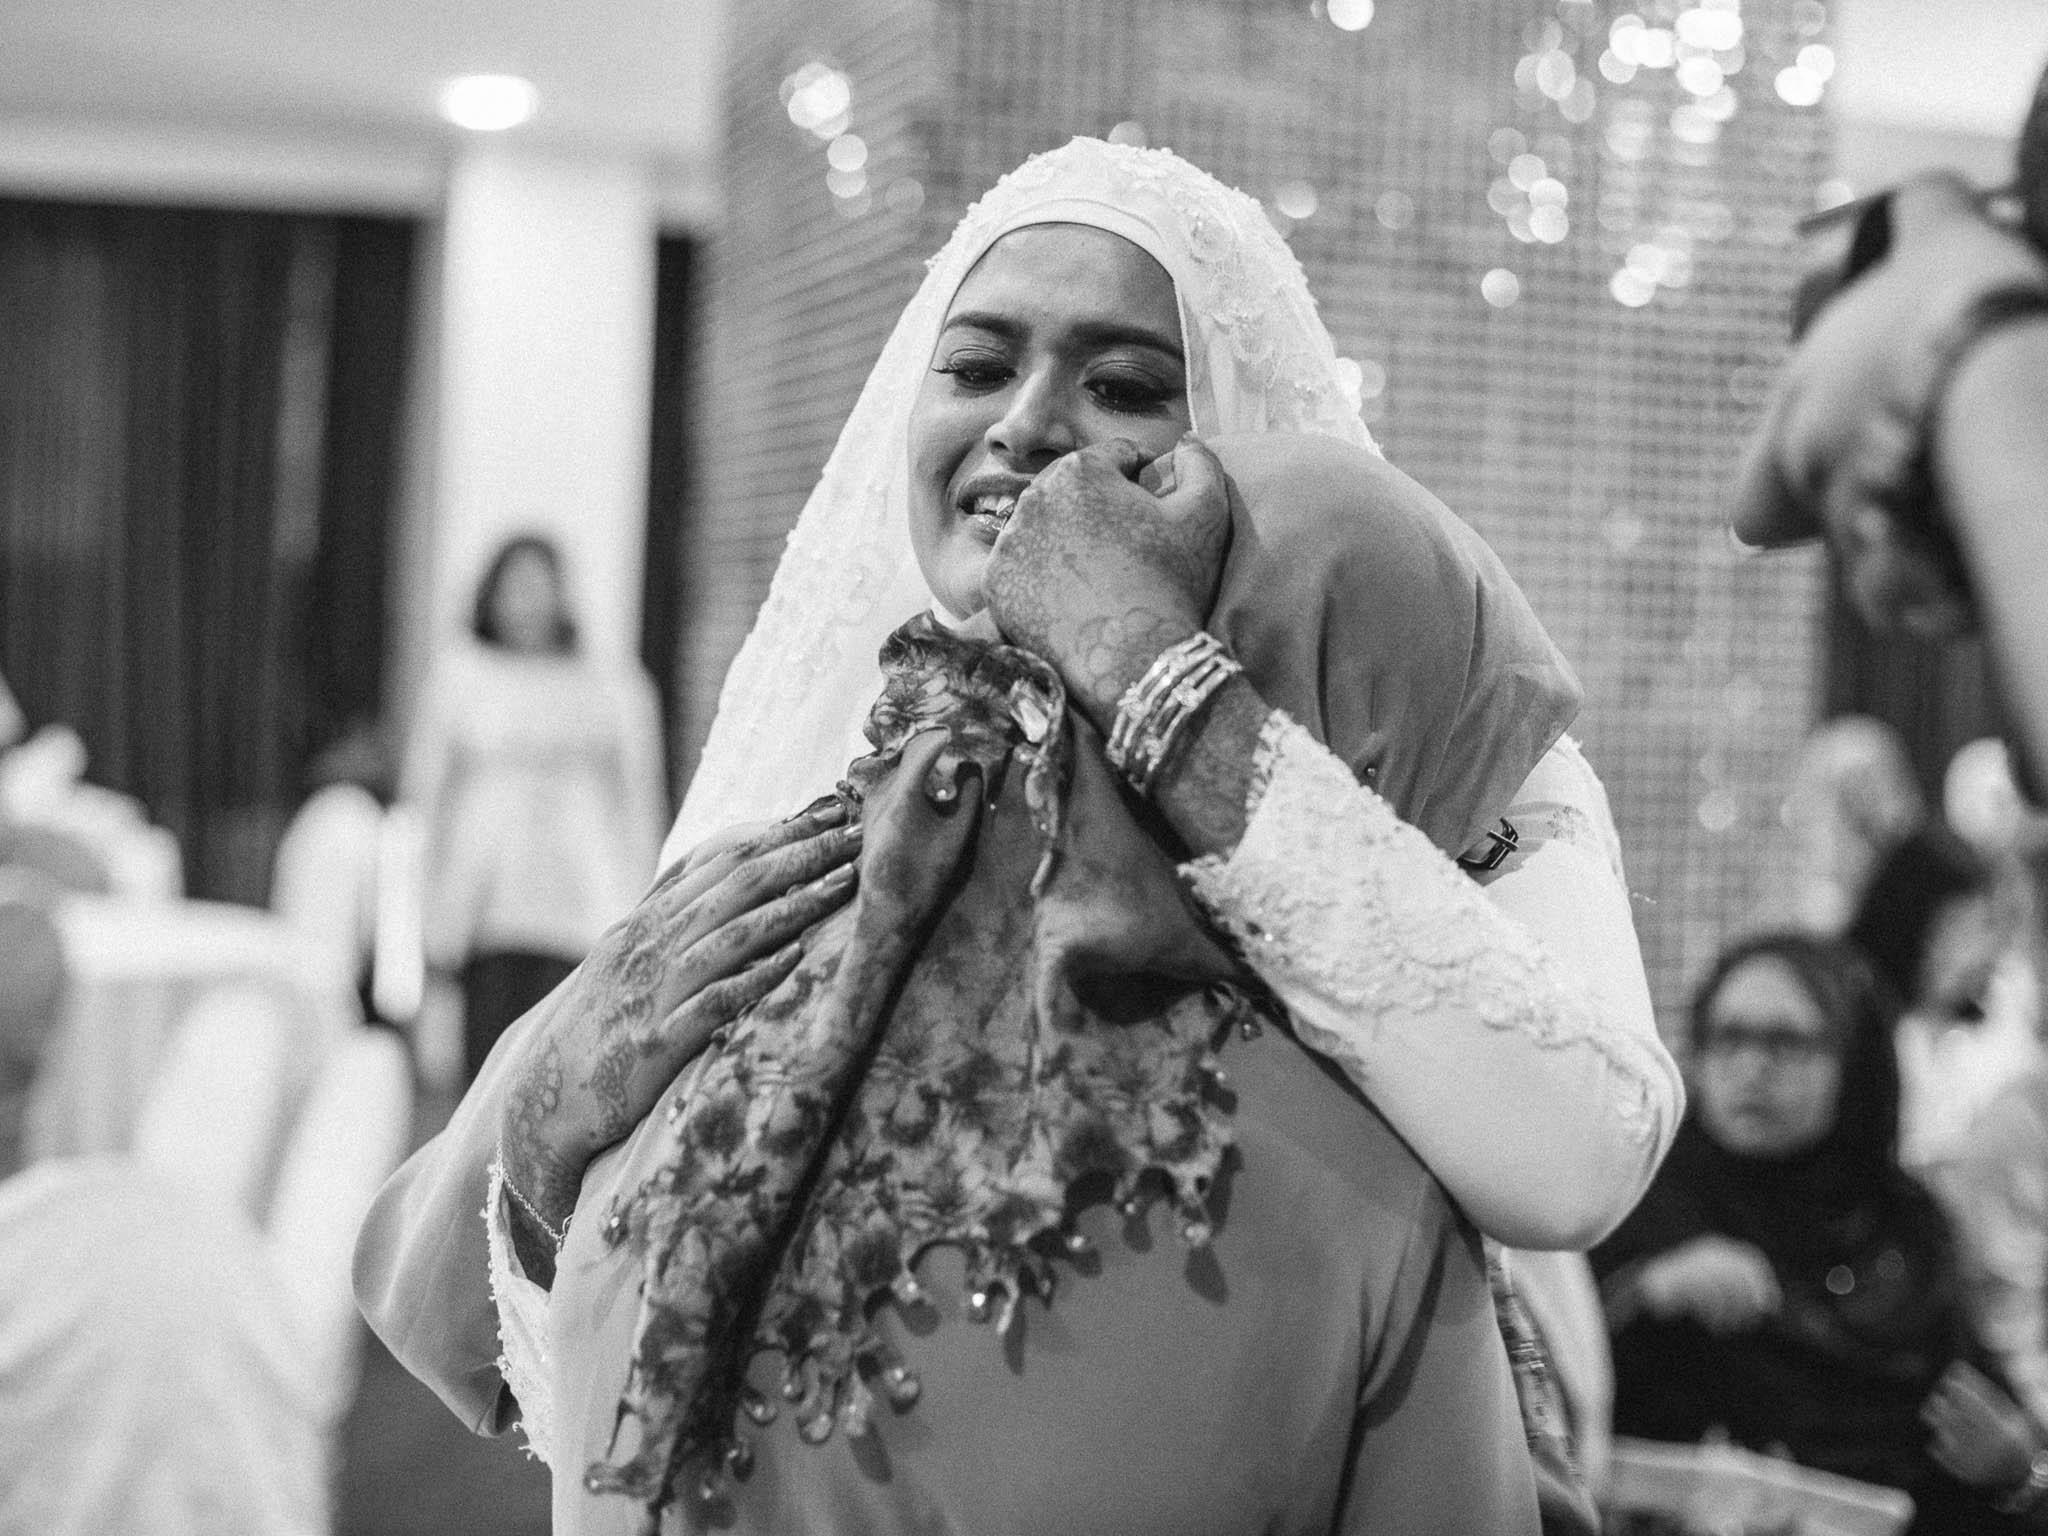 singapore-wedding-photographer-malay-indian-pre-wedding-travel-wmt-2015-shereen-farid-33.jpg